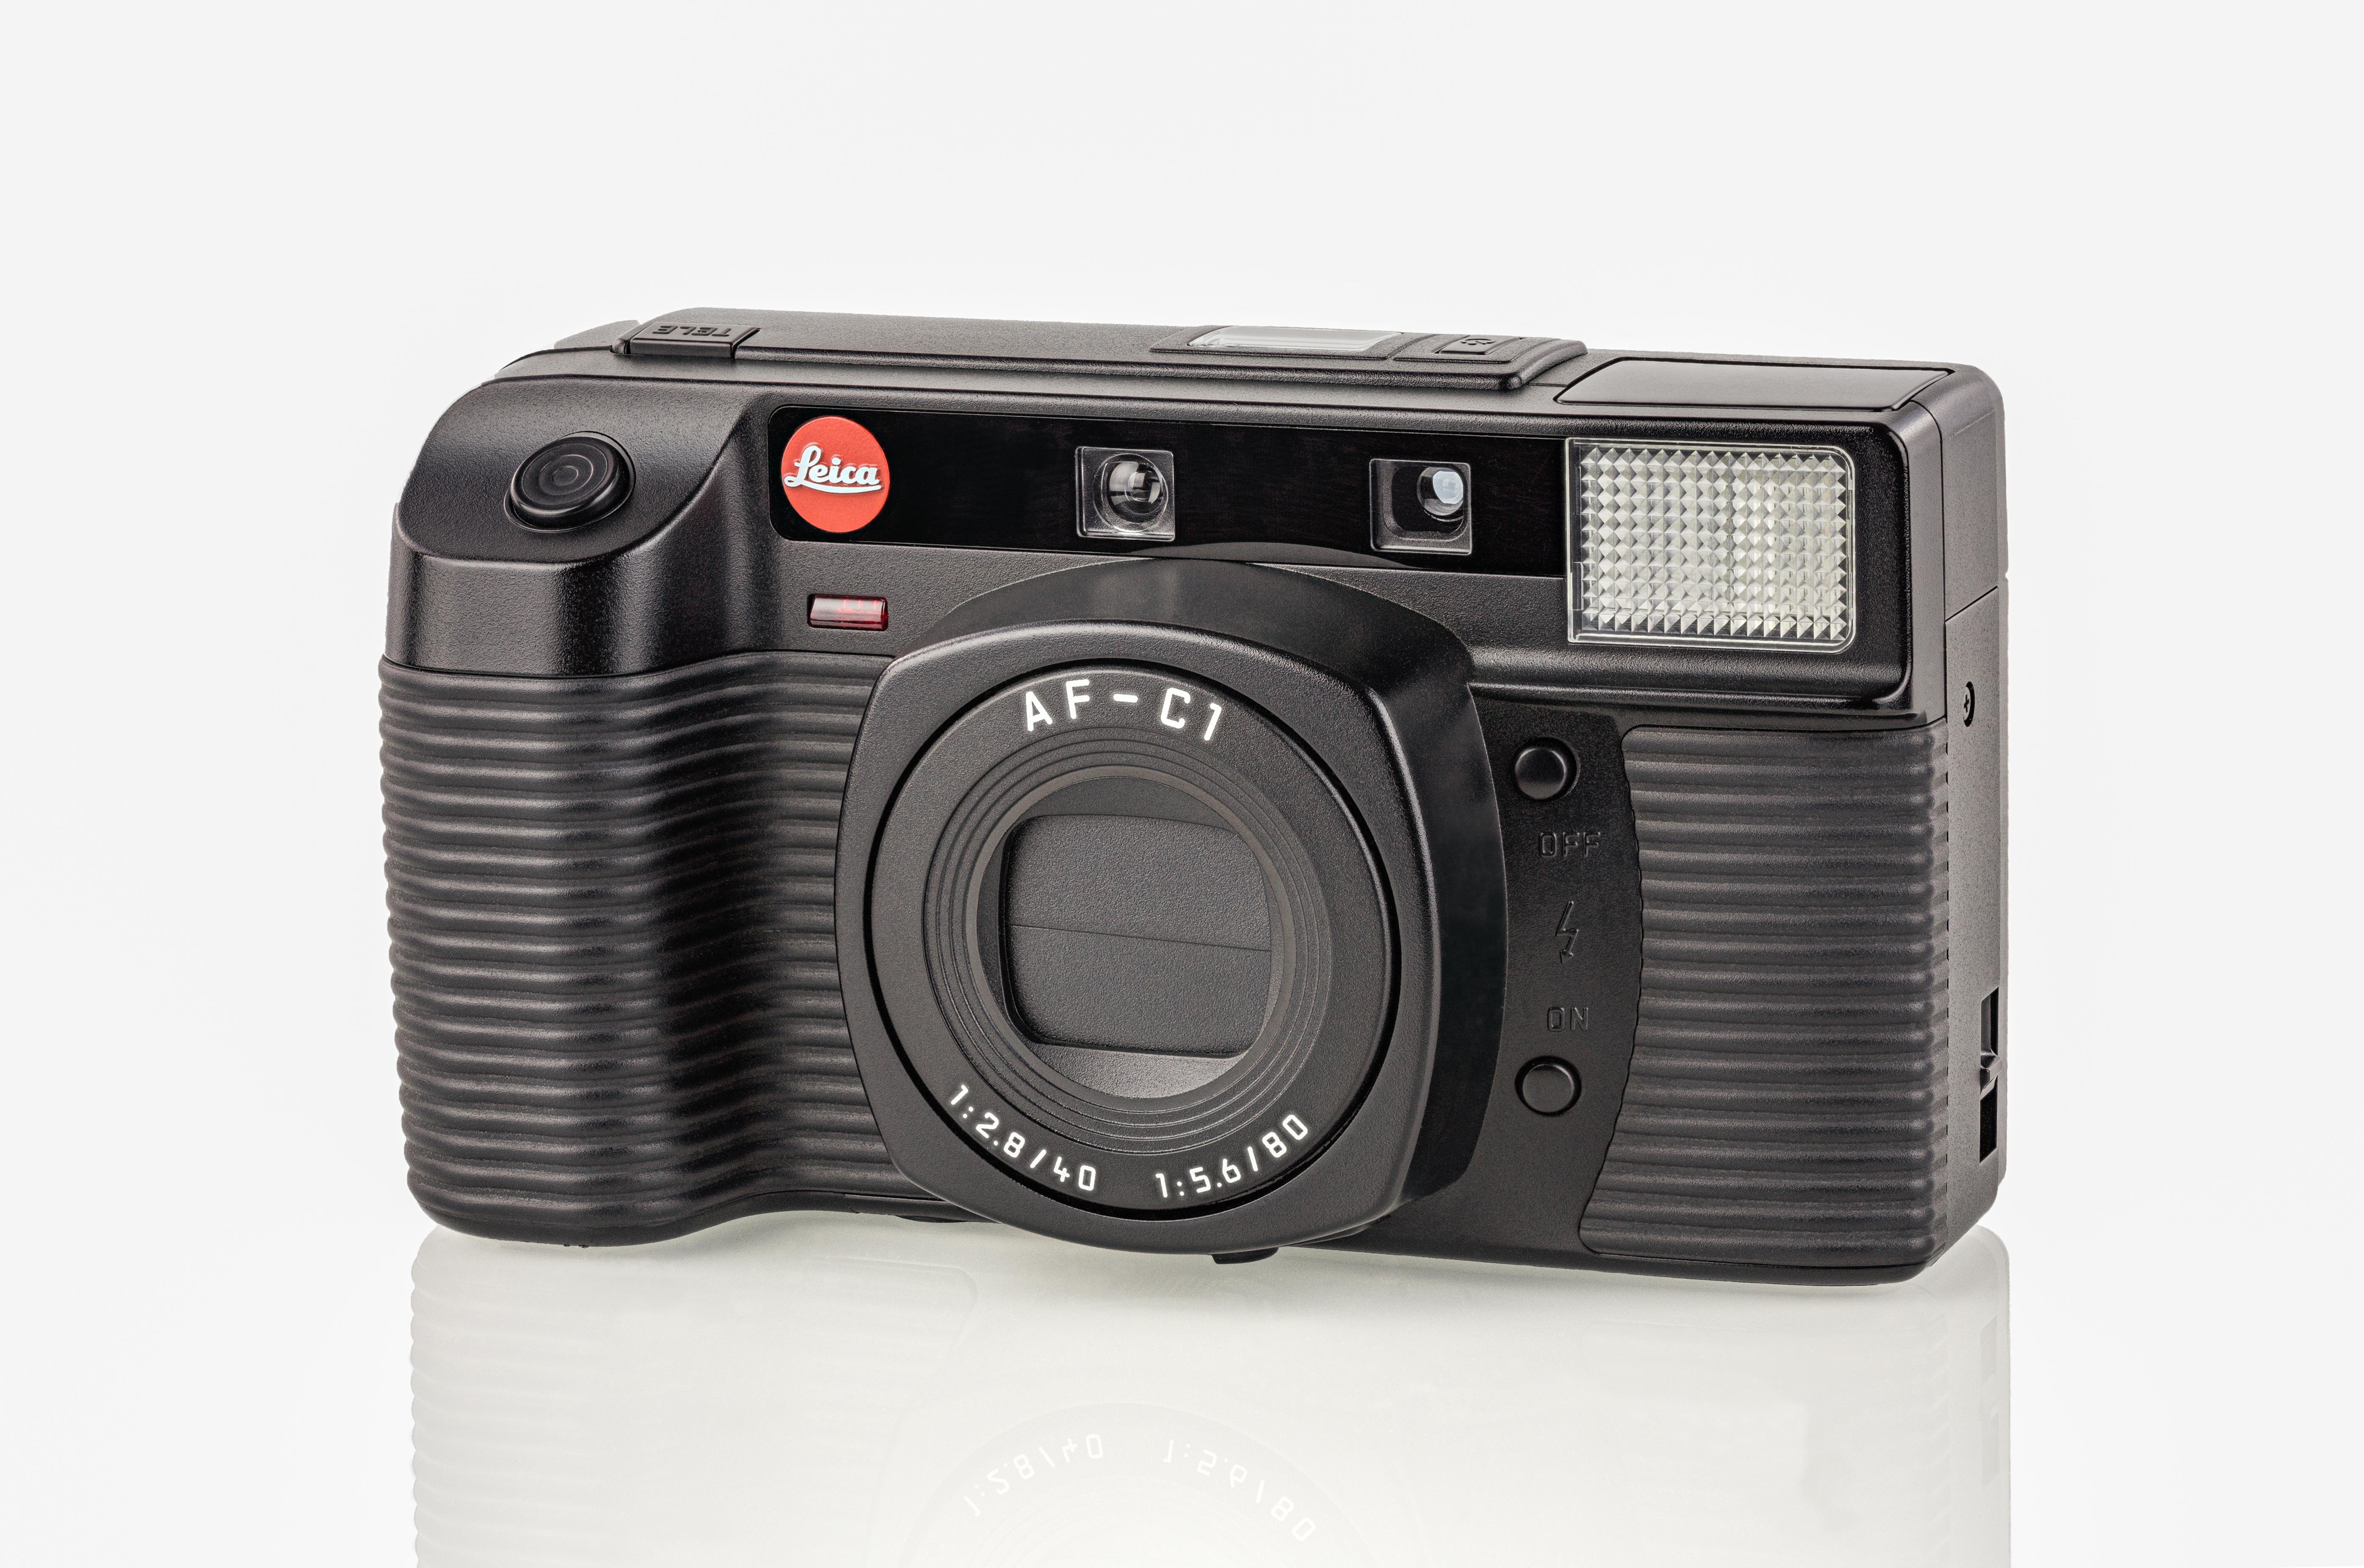 Leica geovid bd fernglas mit entfernungsmesser army store